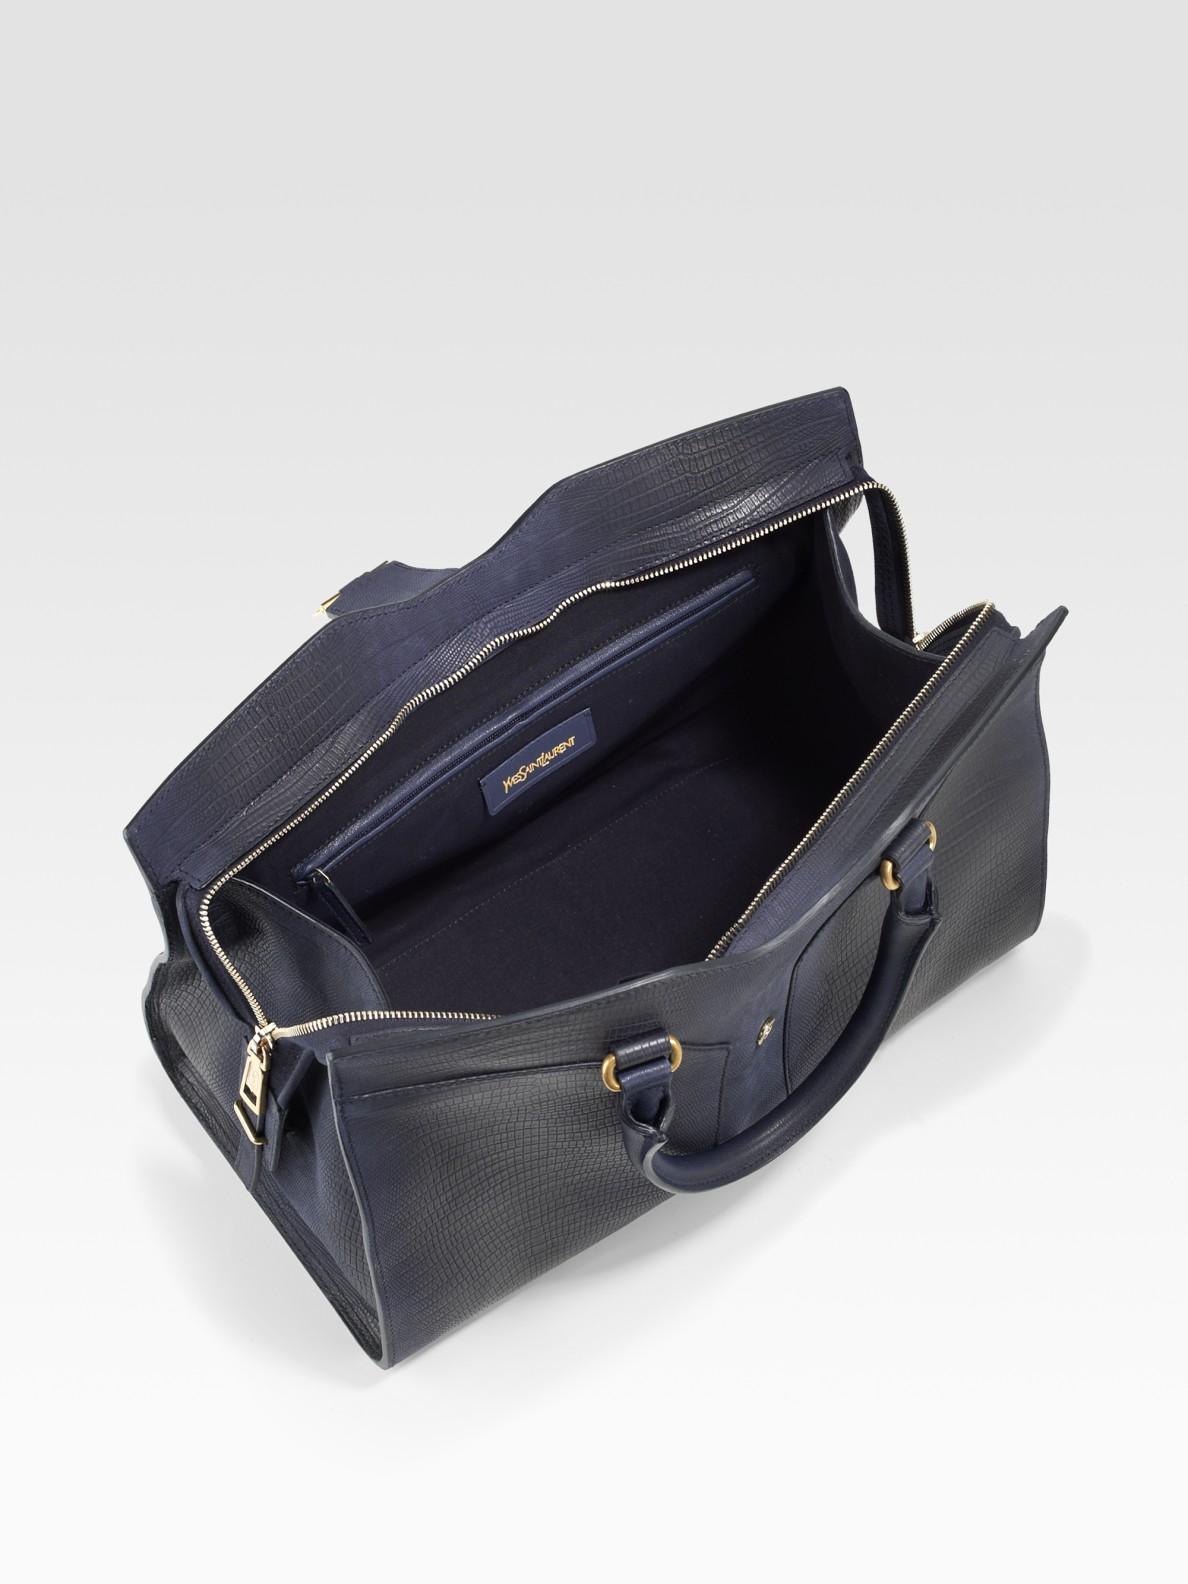 aaa replica ysl clutches bags gold handbags, ysl ...